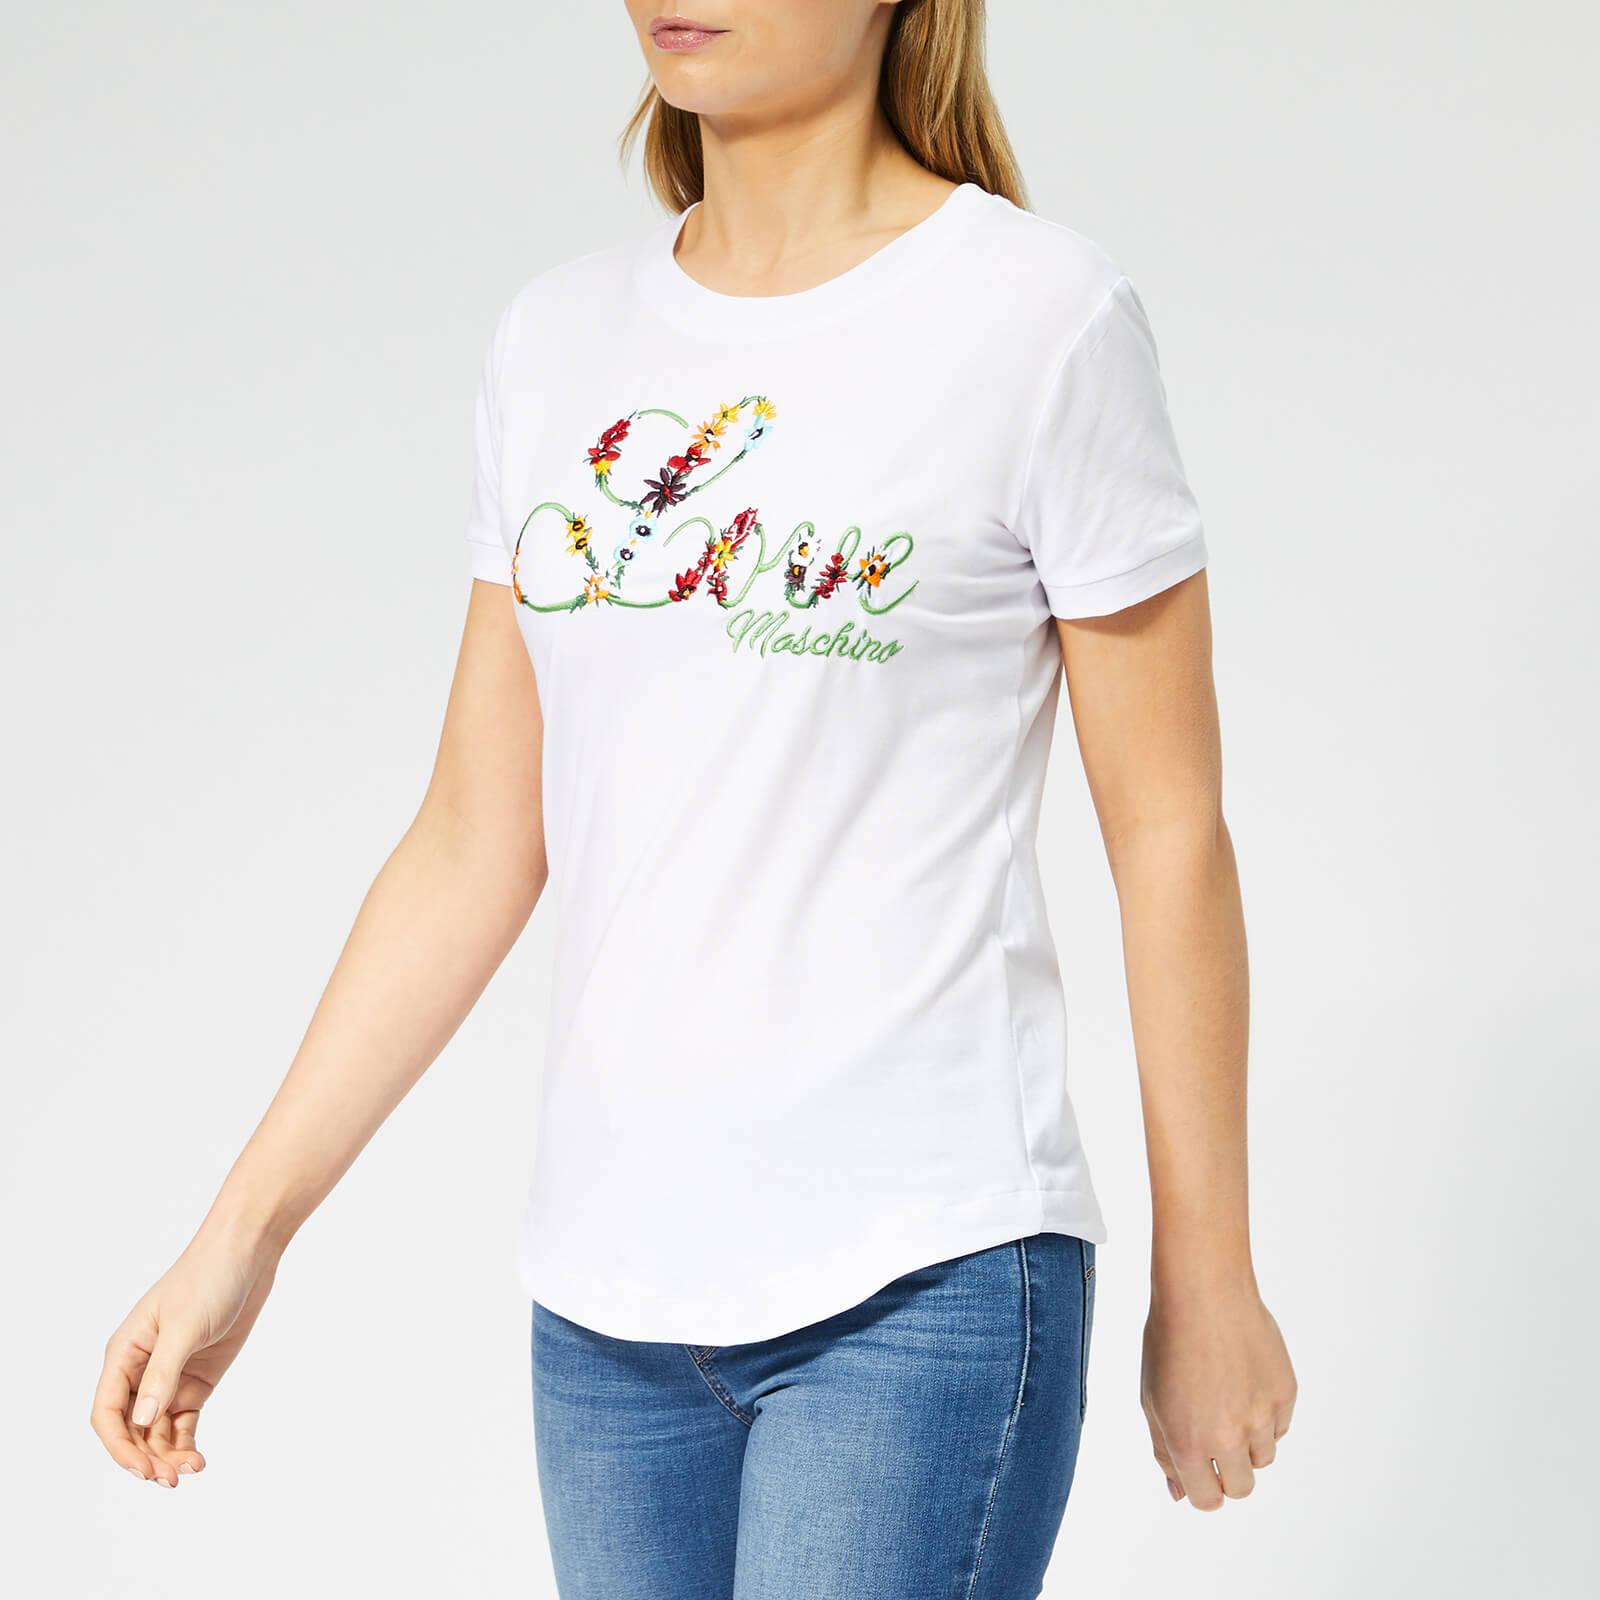 Moschino Love Moschino Women's Floral Logo T-Shirt - Optical White - IT 42/UK 10 - White